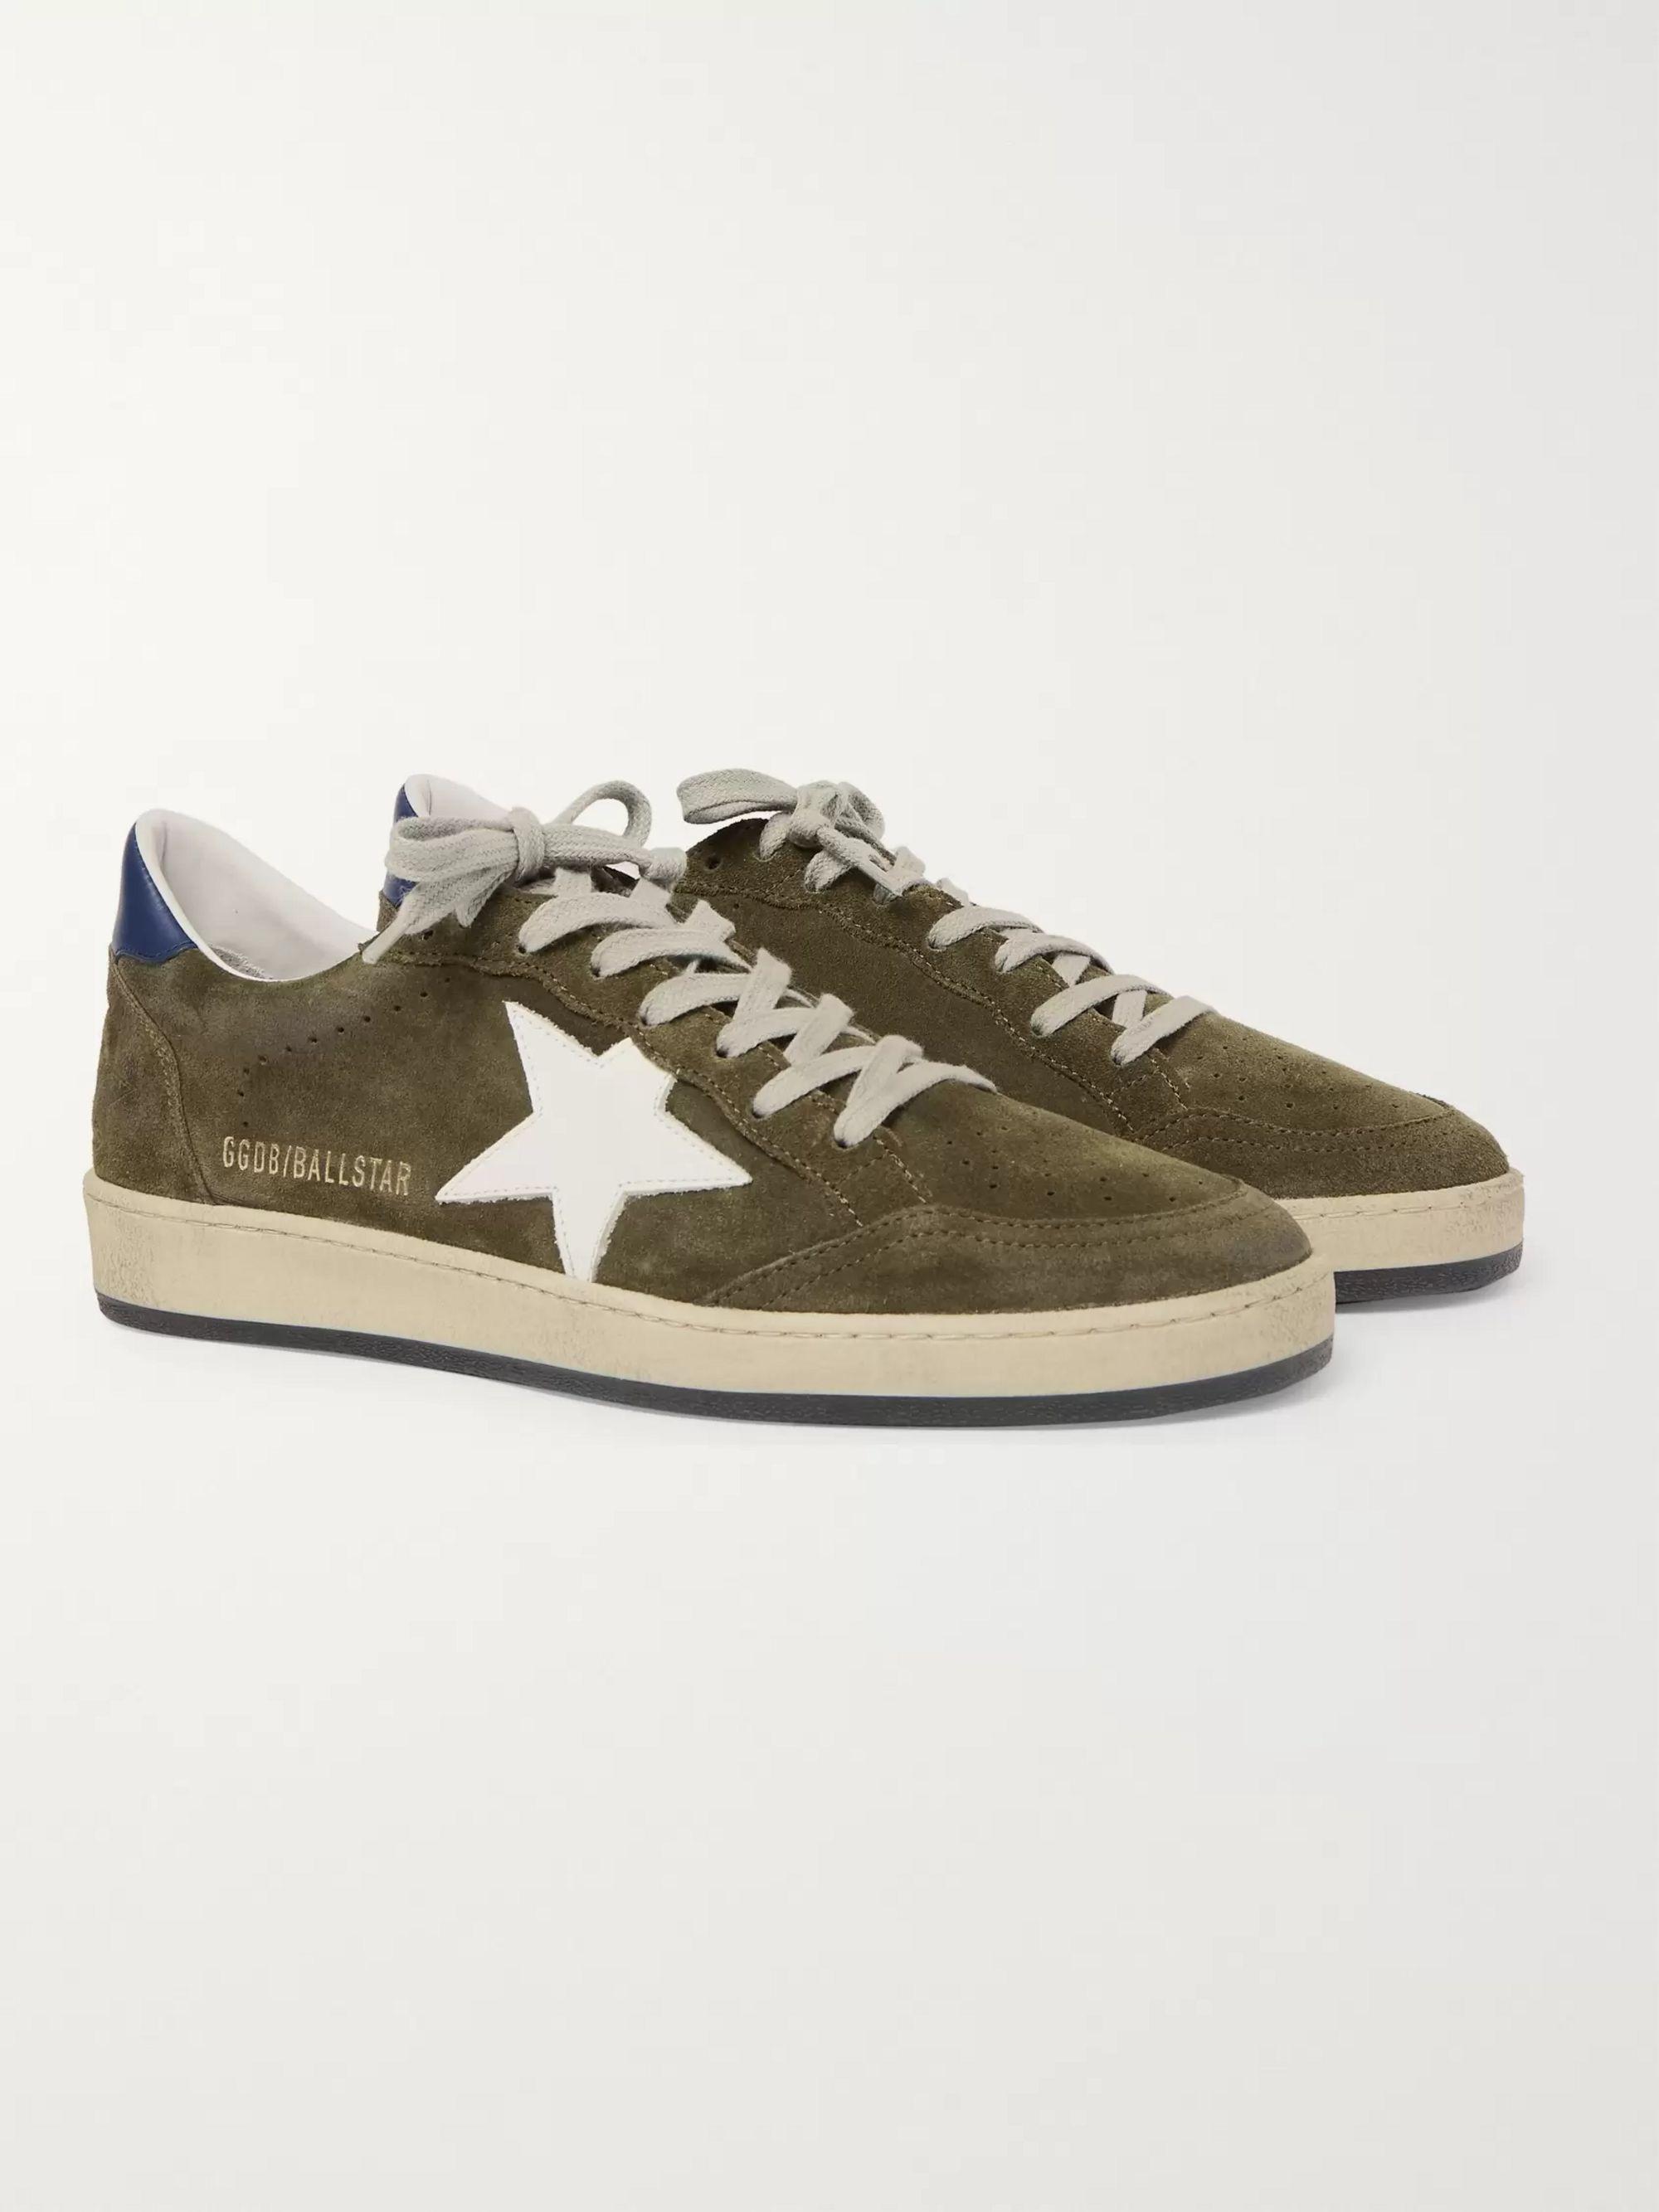 Leather Sneakers   Golden Goose   MR PORTER